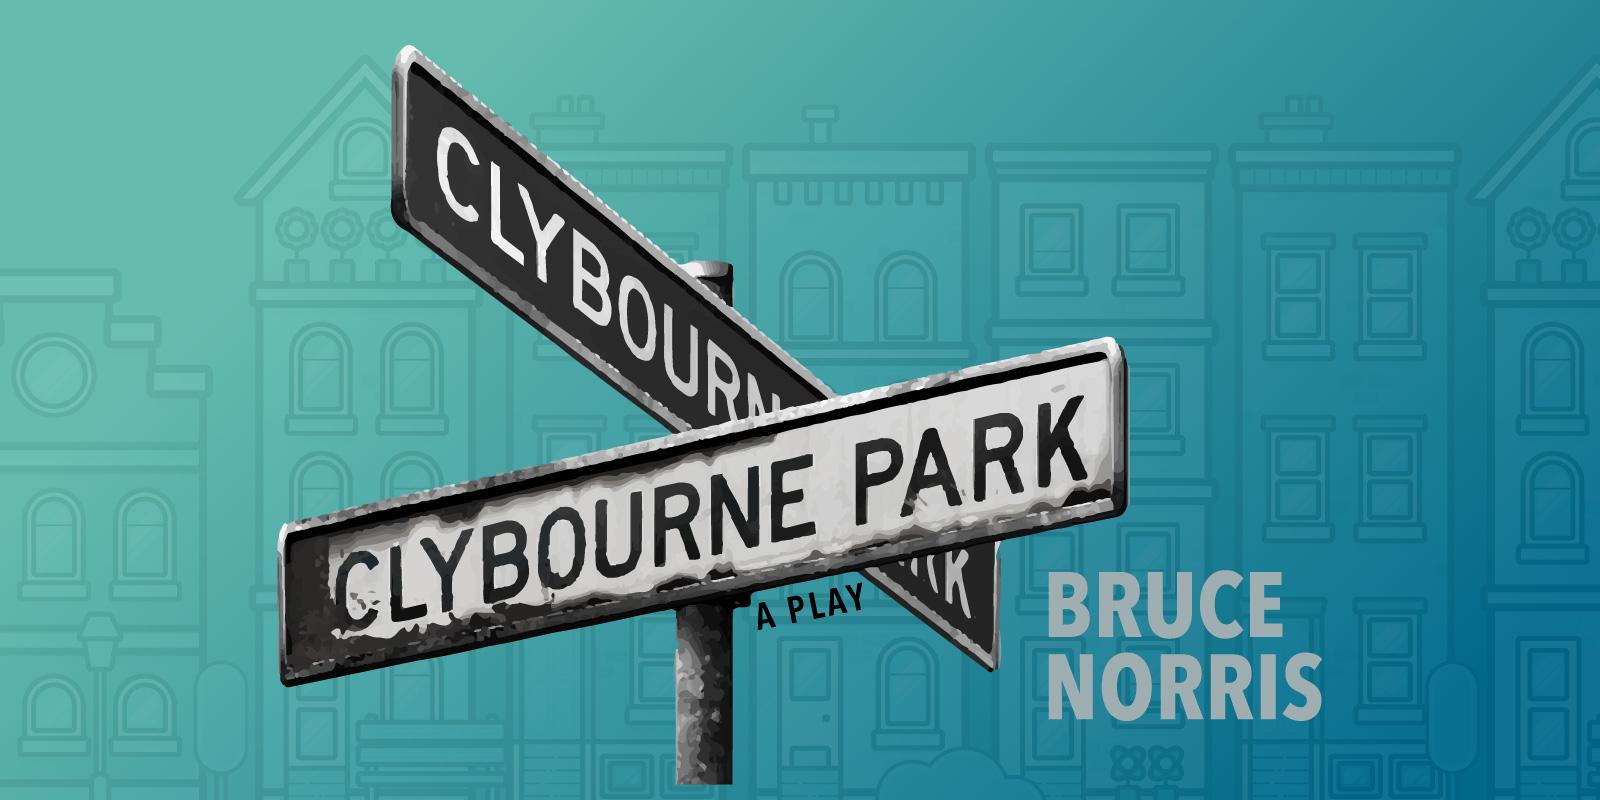 www.artshhi.com/events/clybourne-park